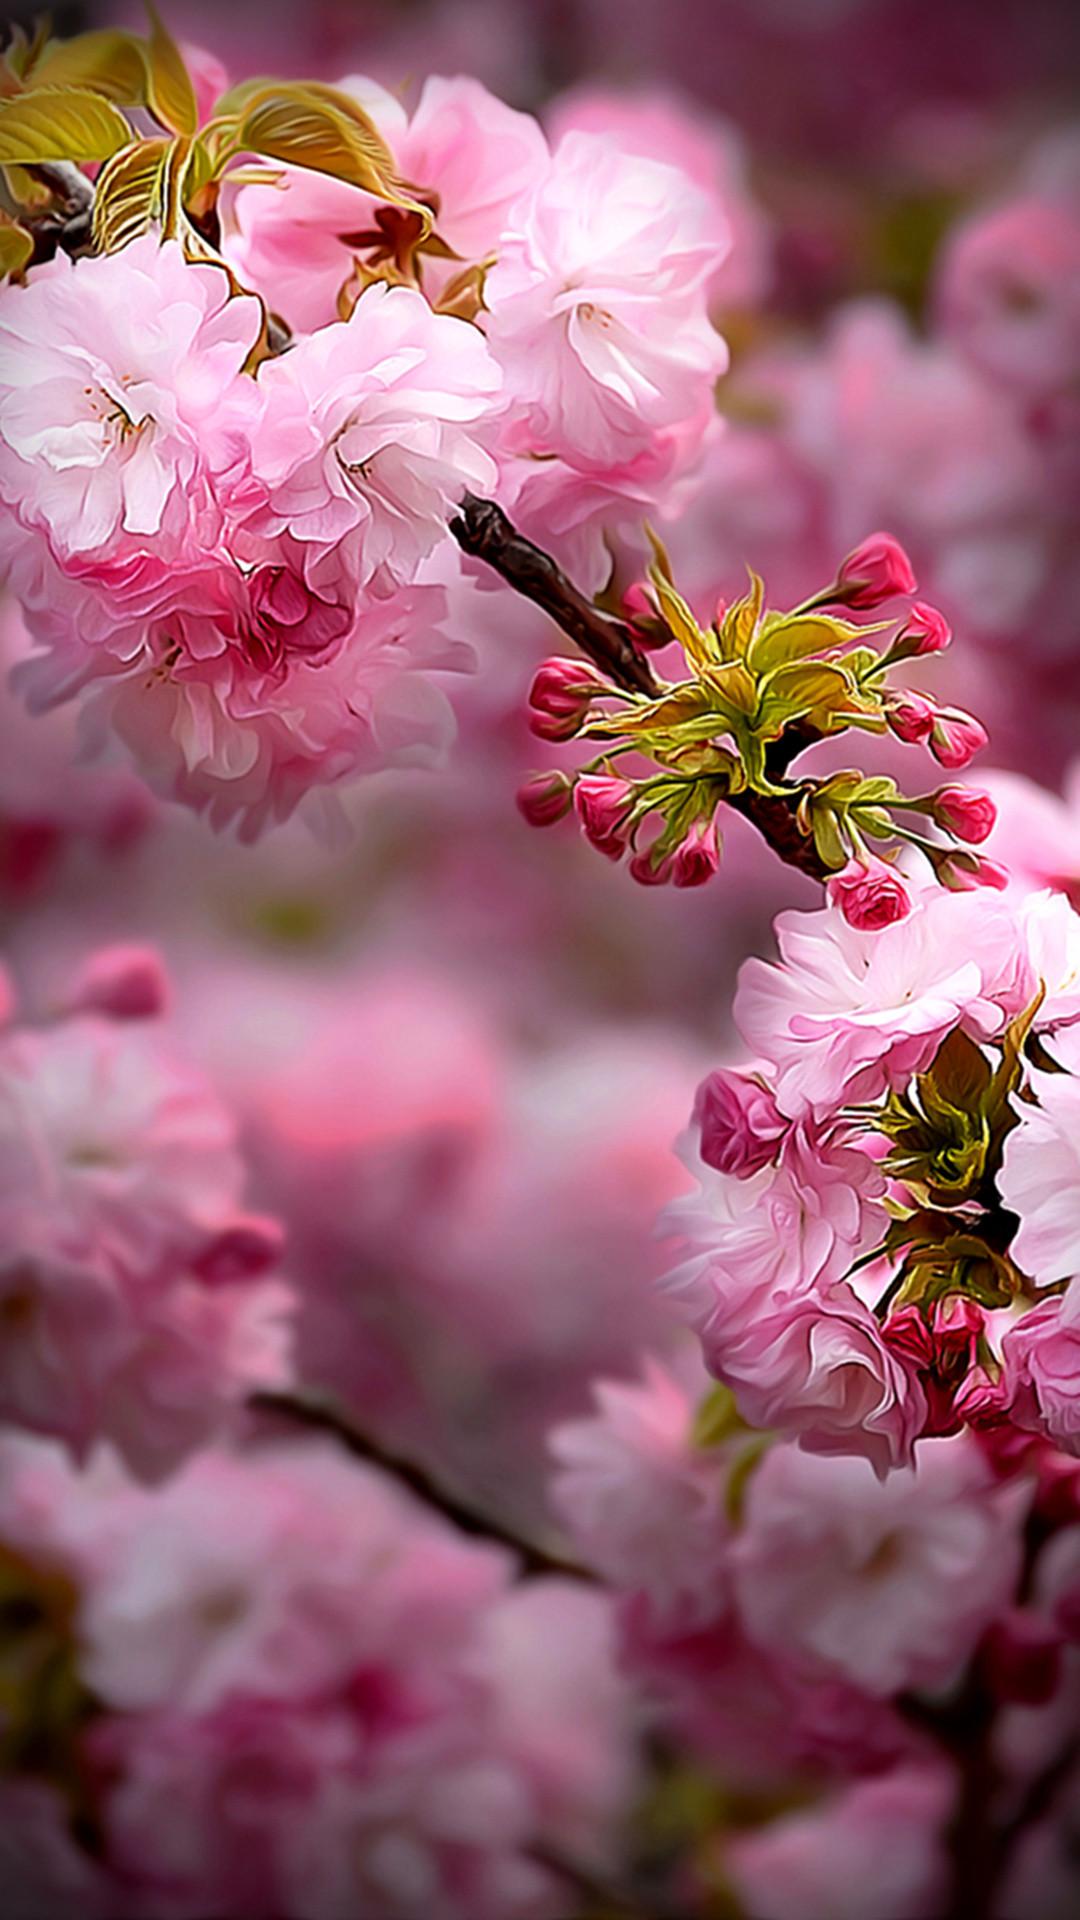 Spring   Hd Phone Wallpaper Flower 151888   HD Wallpaper Download 1080x1920